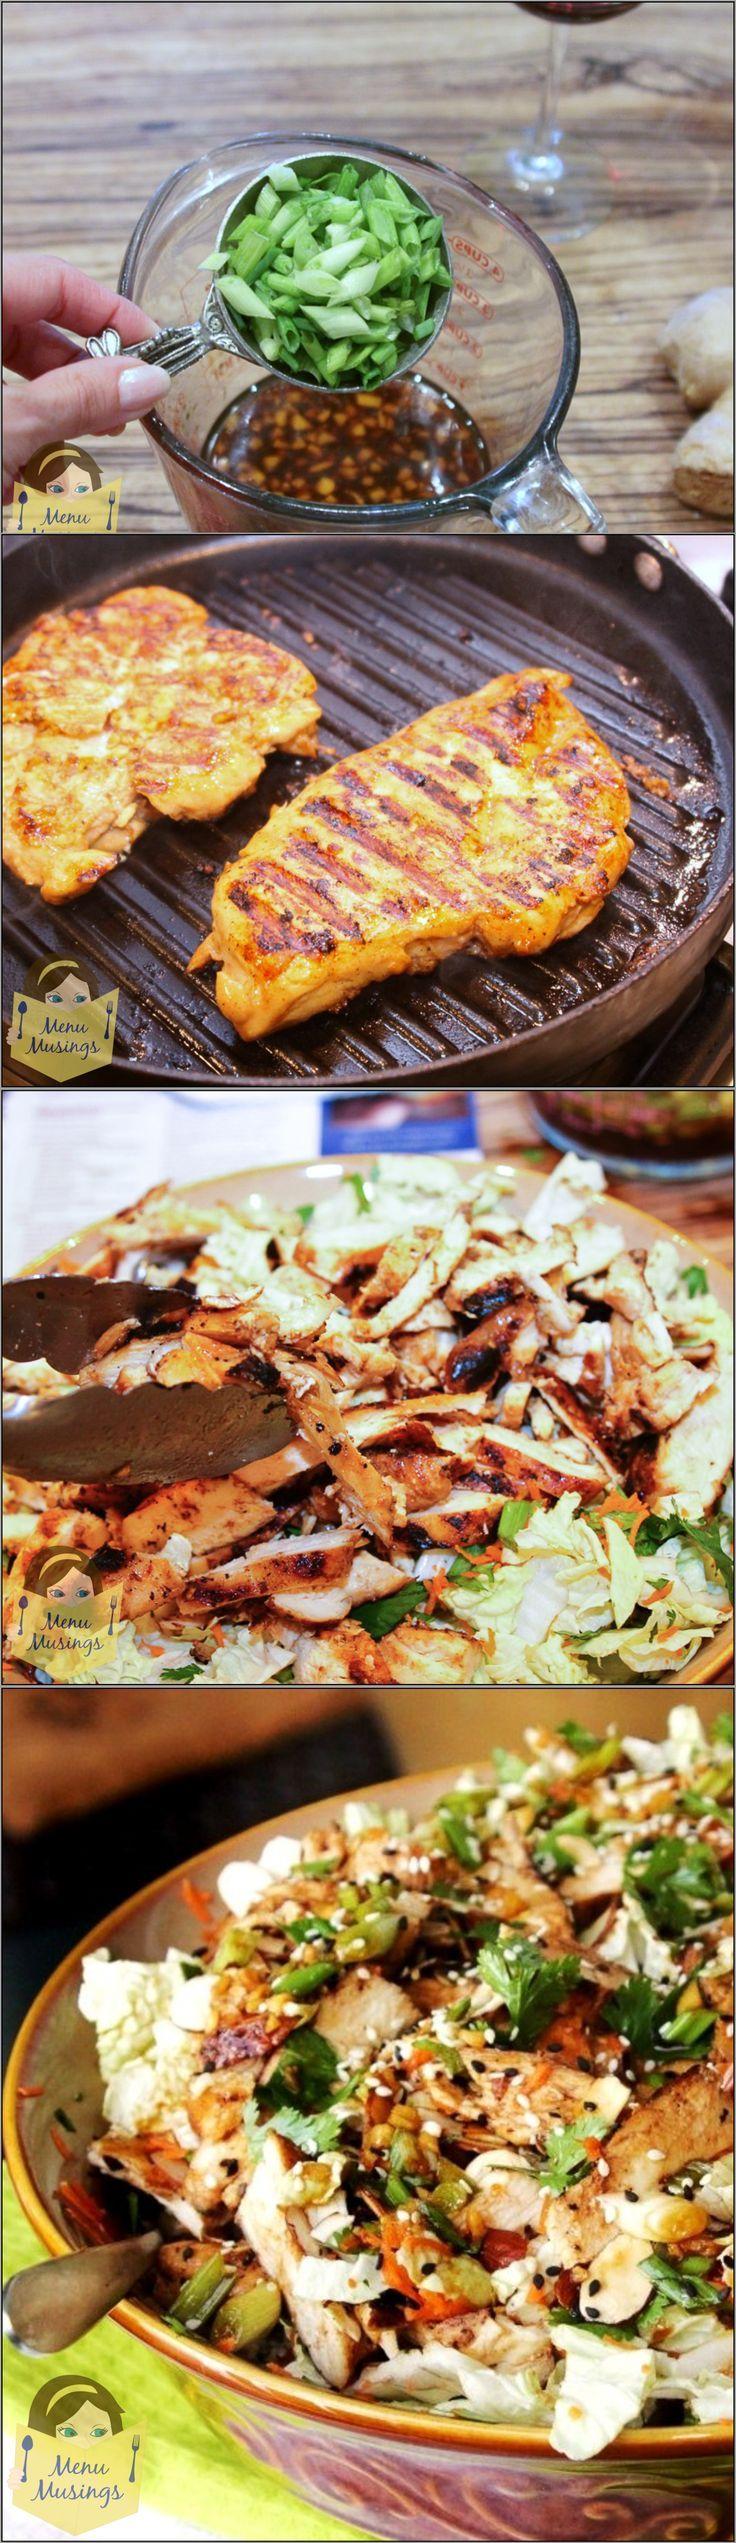 Hoisin Explosion Chicken Recipes — Dishmaps